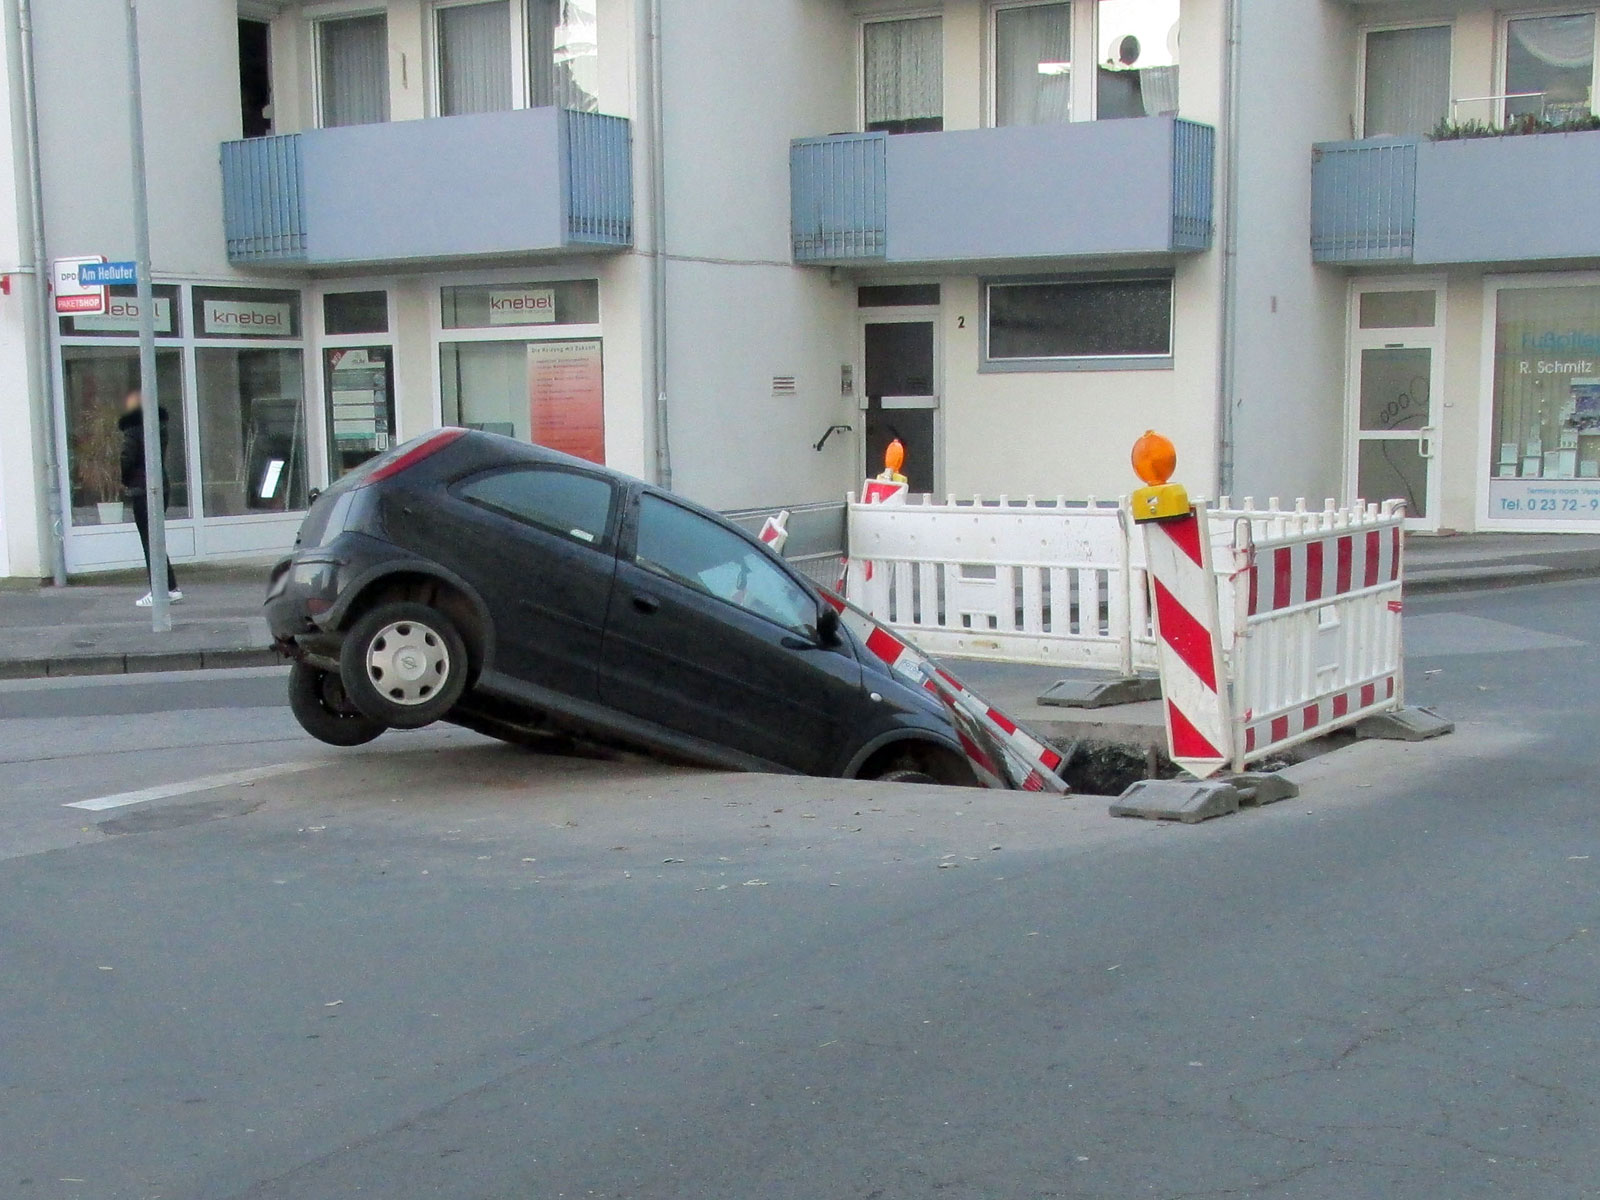 Großzügig Online Autounfall Simulator Fotos - Schaltplan Serie ...